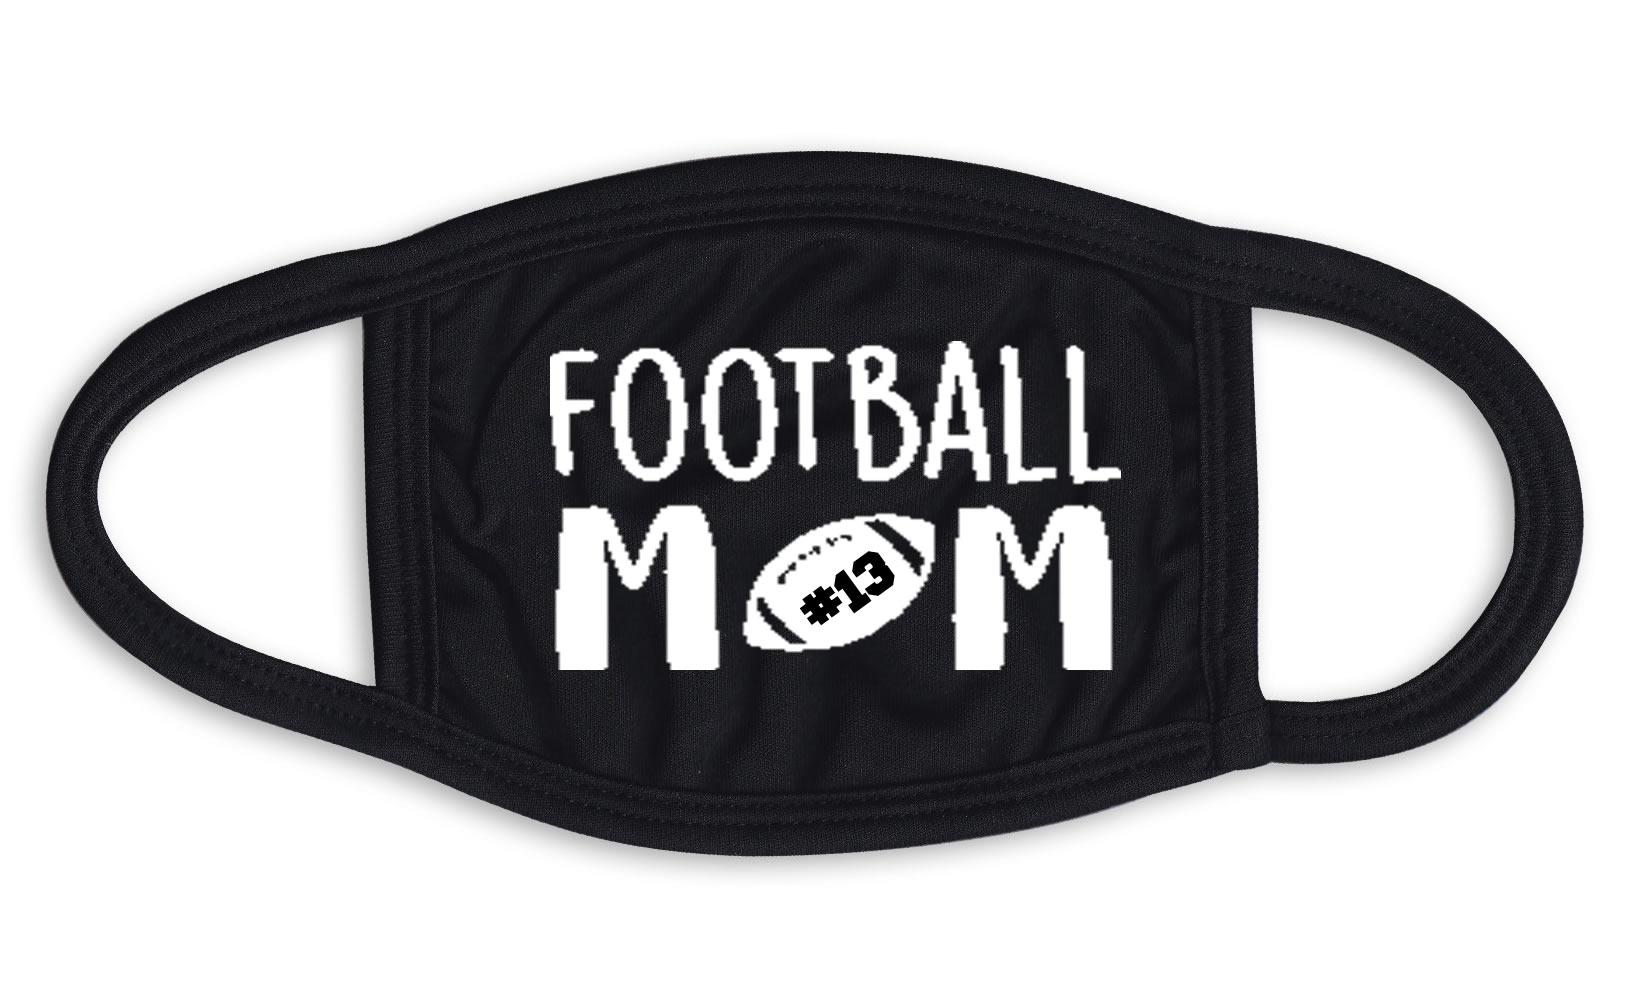 Football Mom Face Mask